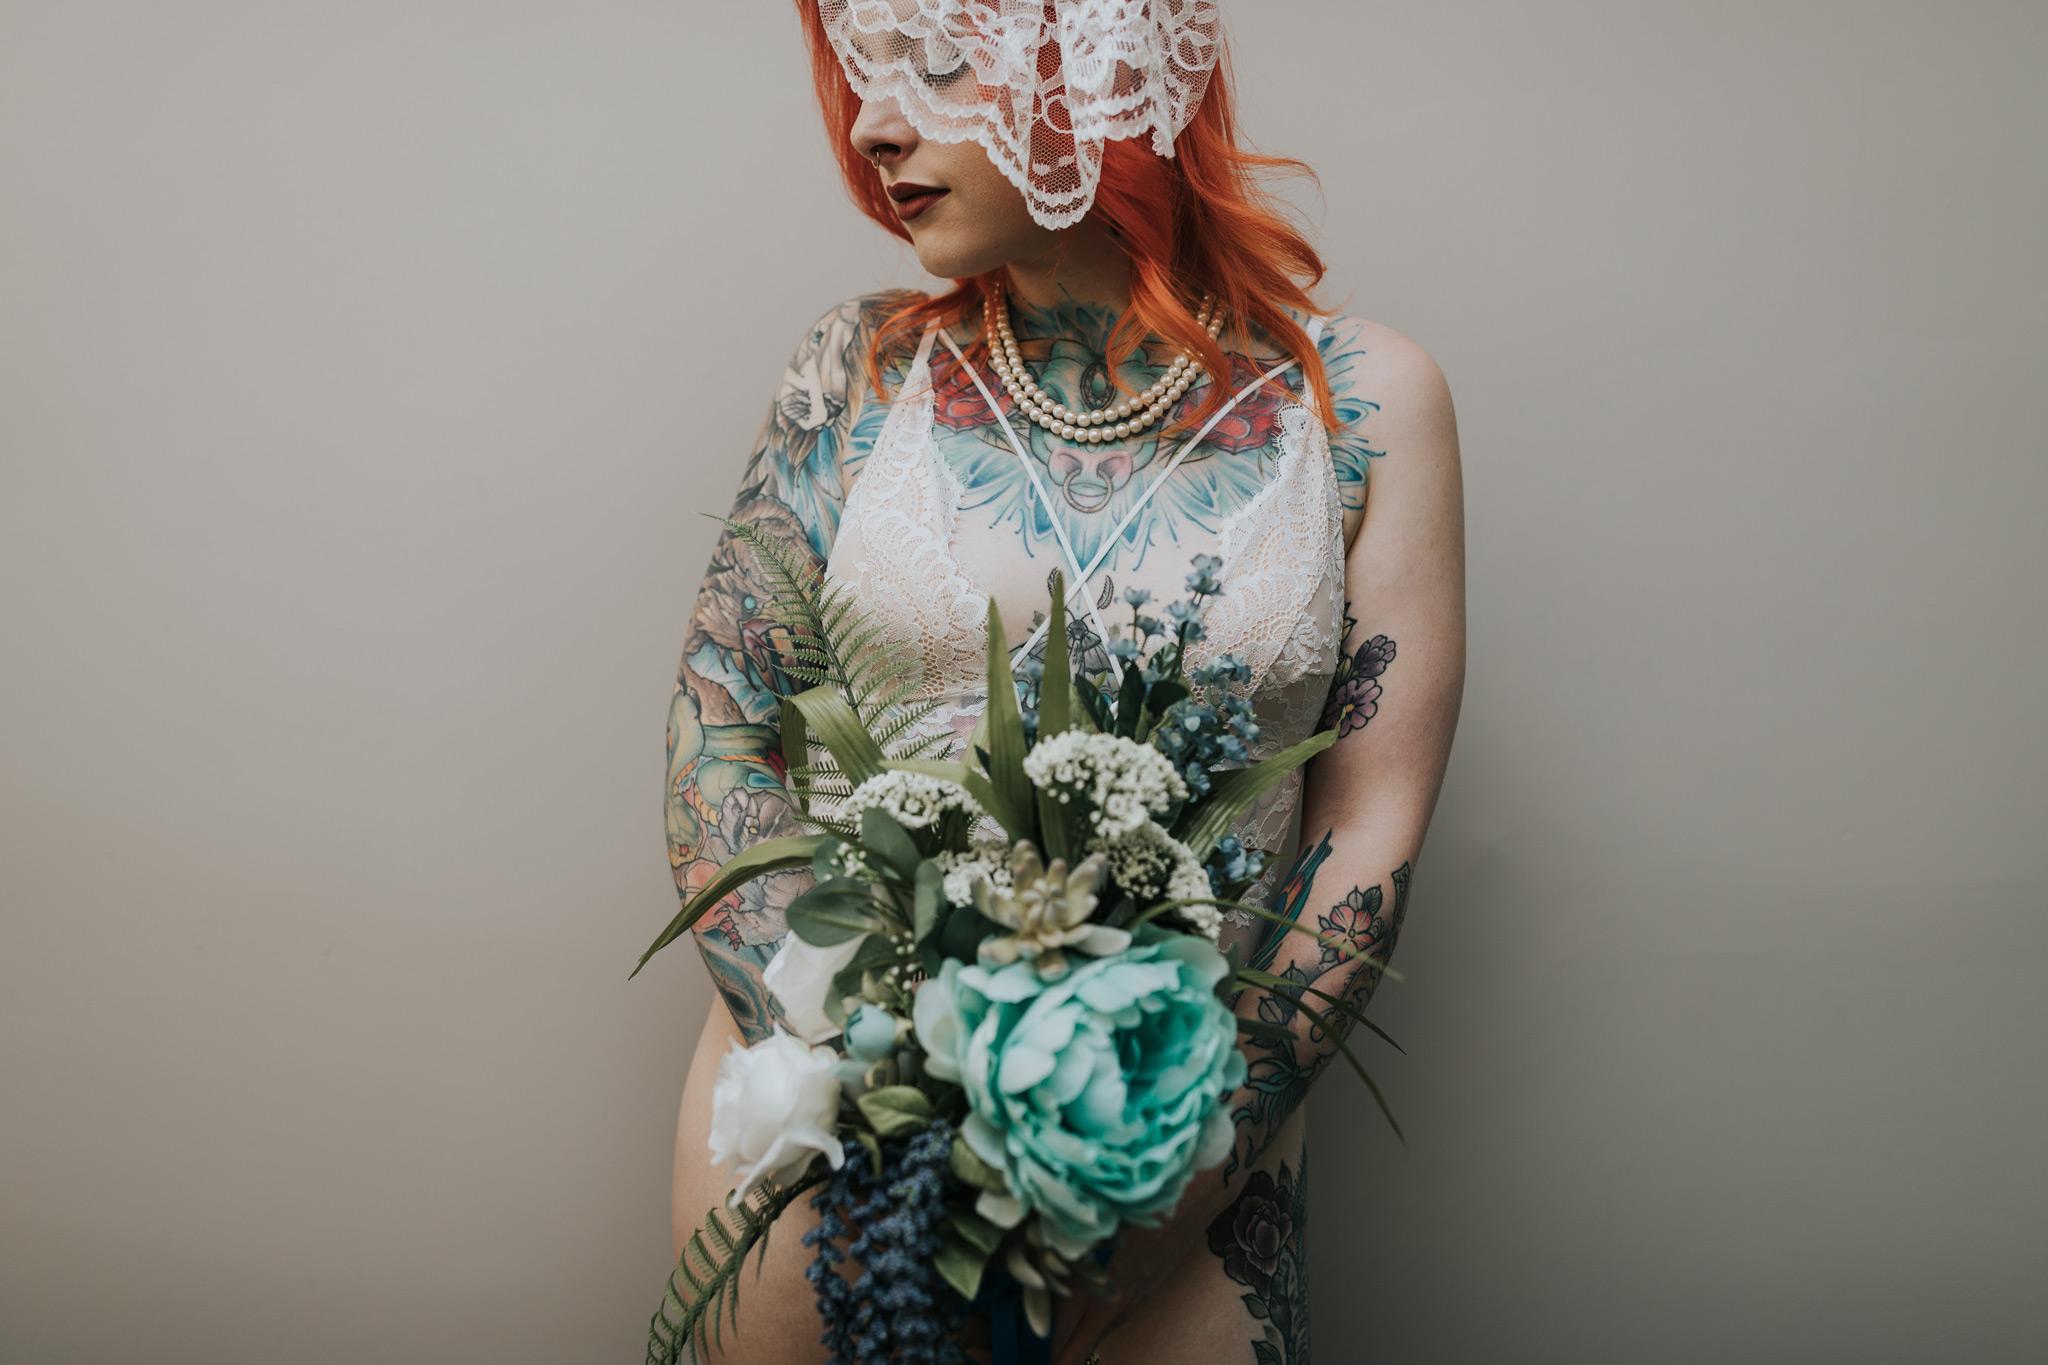 tattooed woman holding bridal bouquet boudoir medicine hat